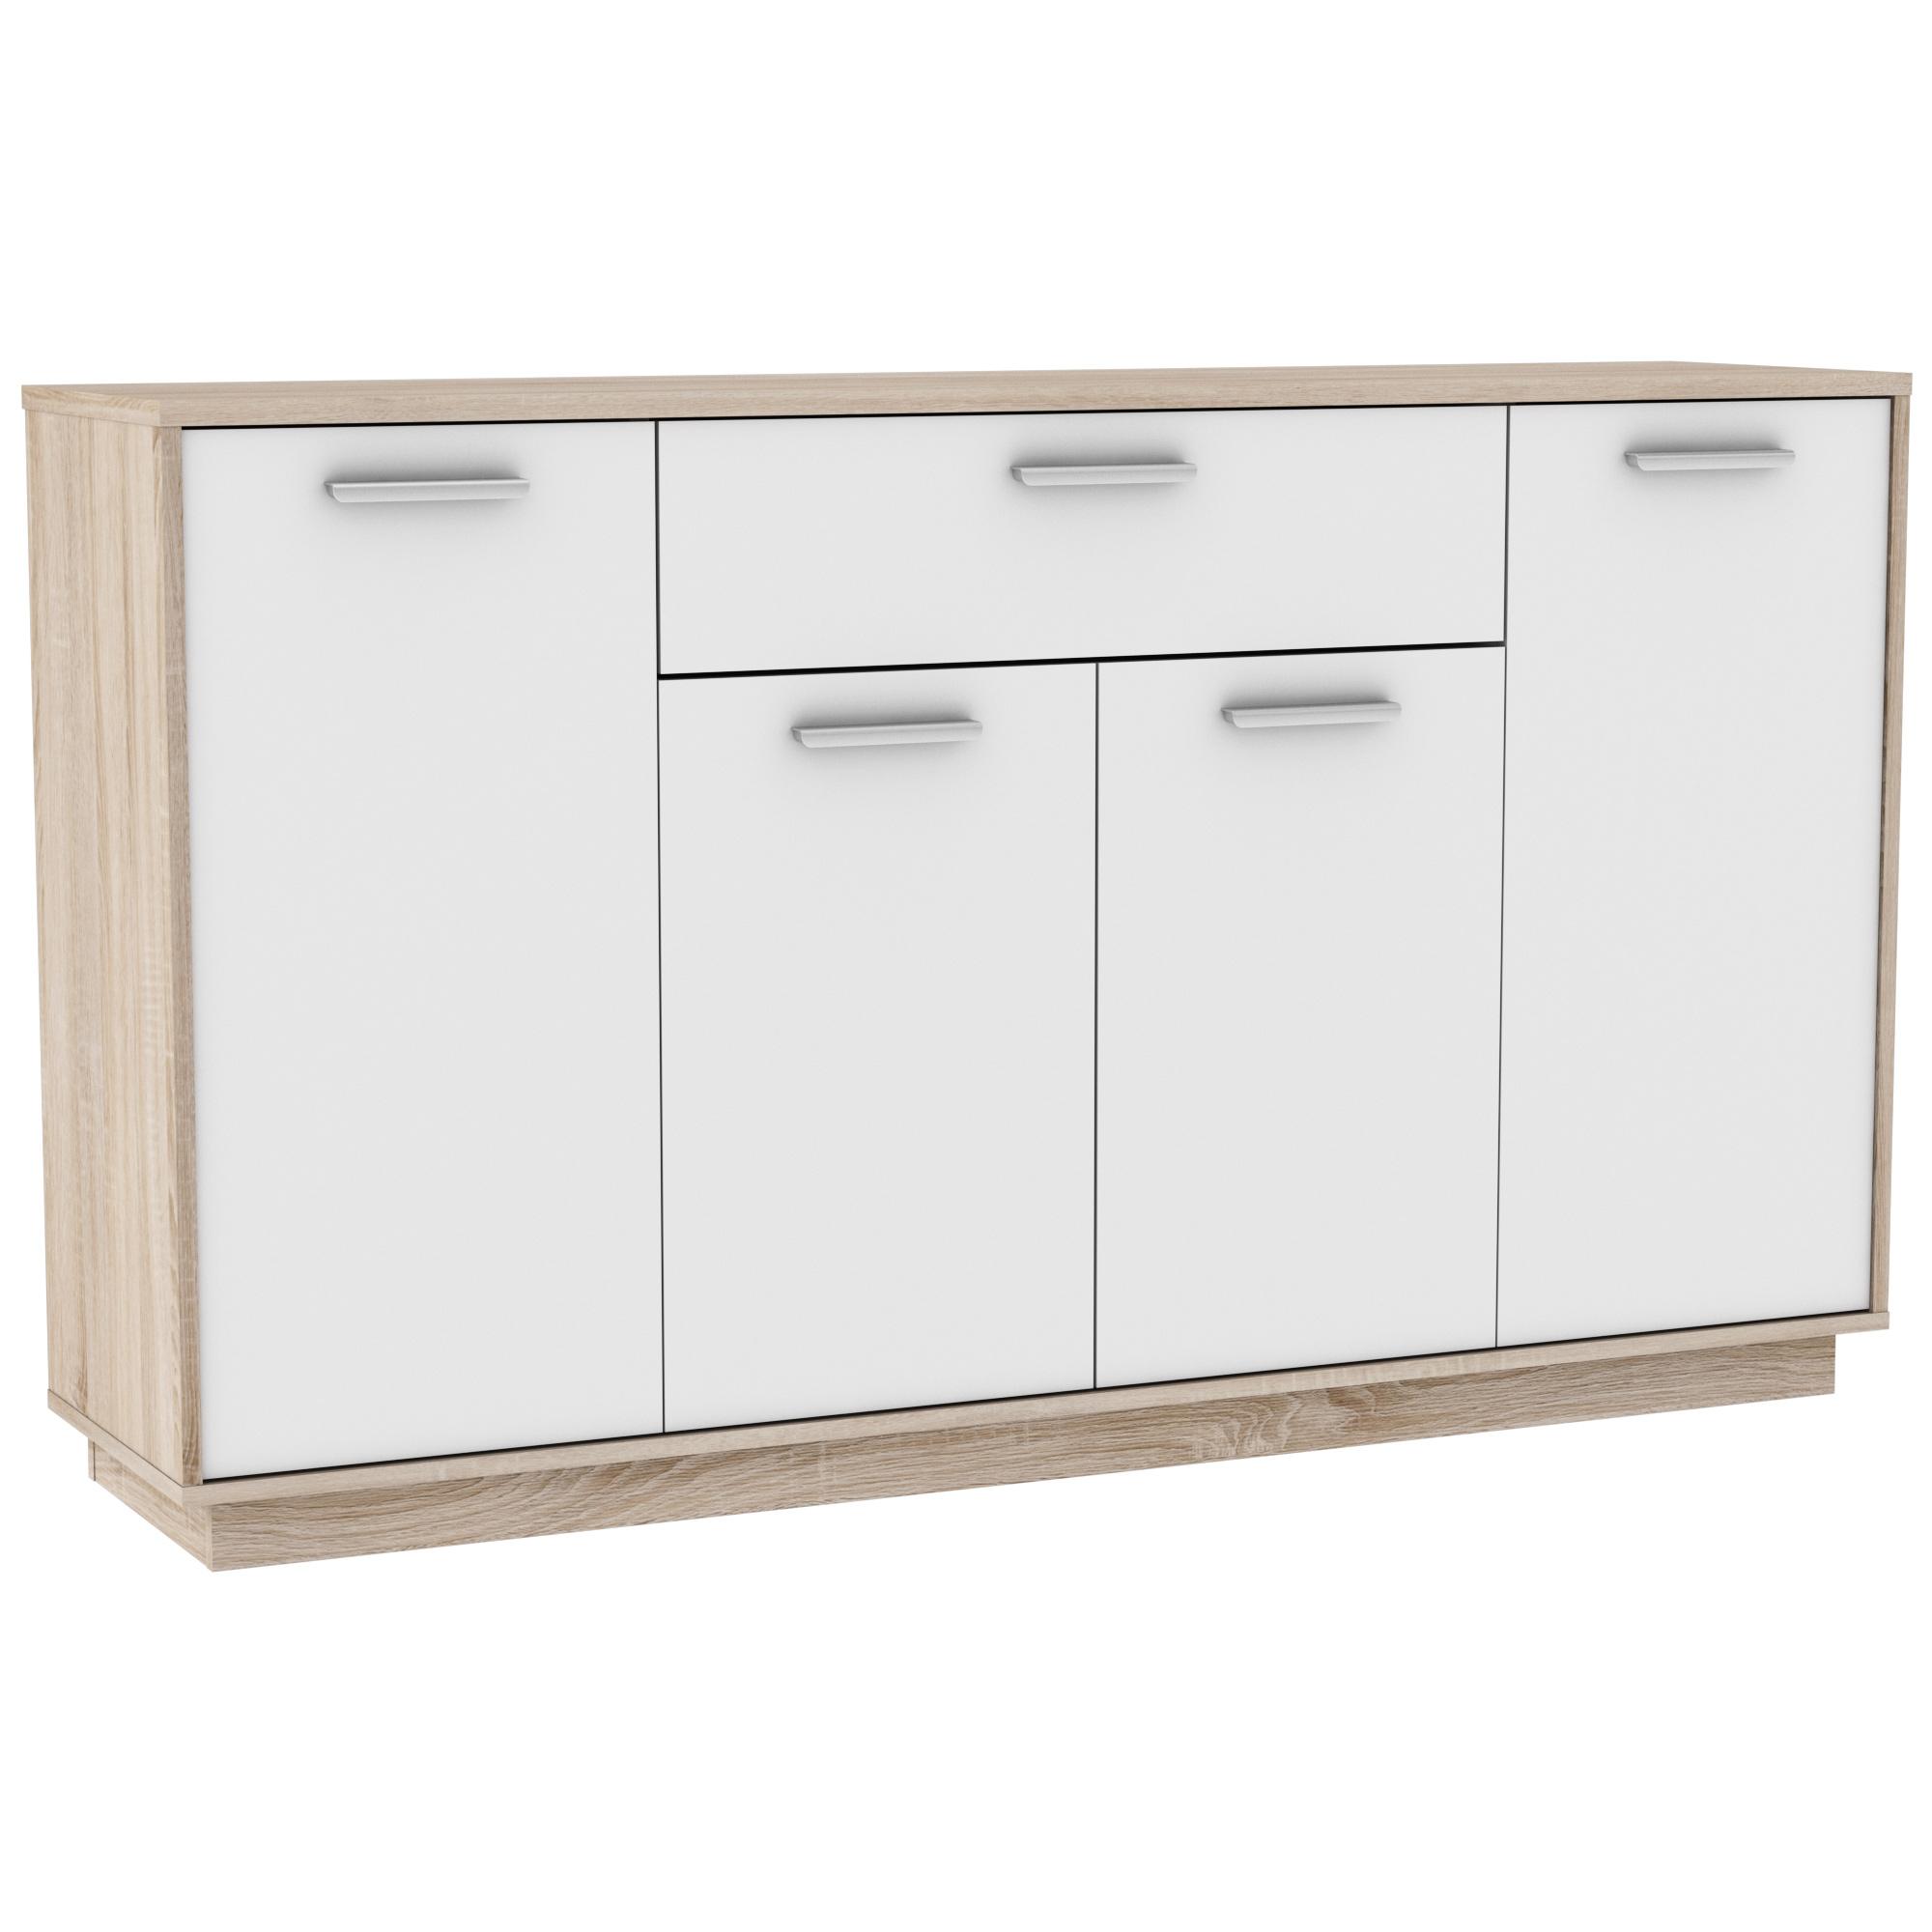 Meuble de rangement contemporain 4 portes/1 tiroir chêne brossé/blanc Sismo